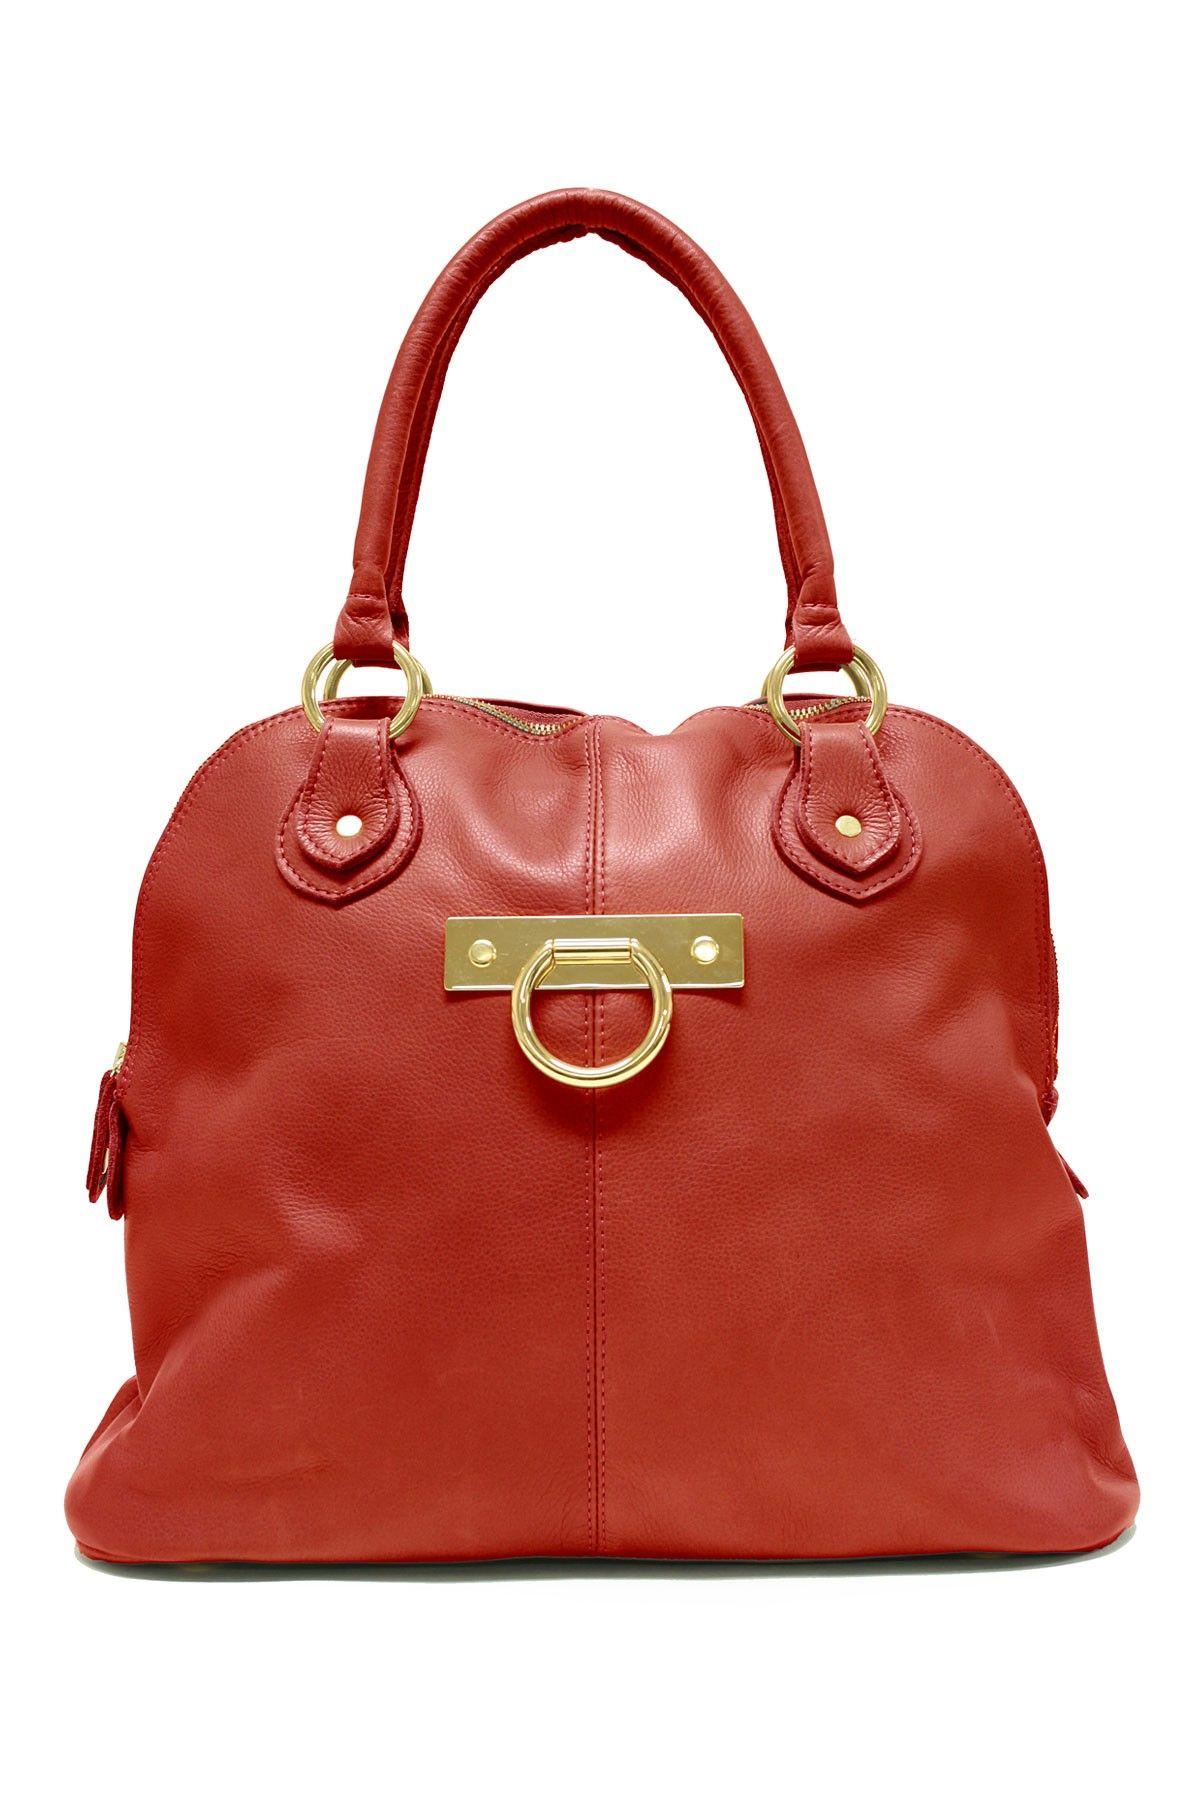 e8abe974a967 Onna Ehrlich Francoise Shoulder Bag  198.00